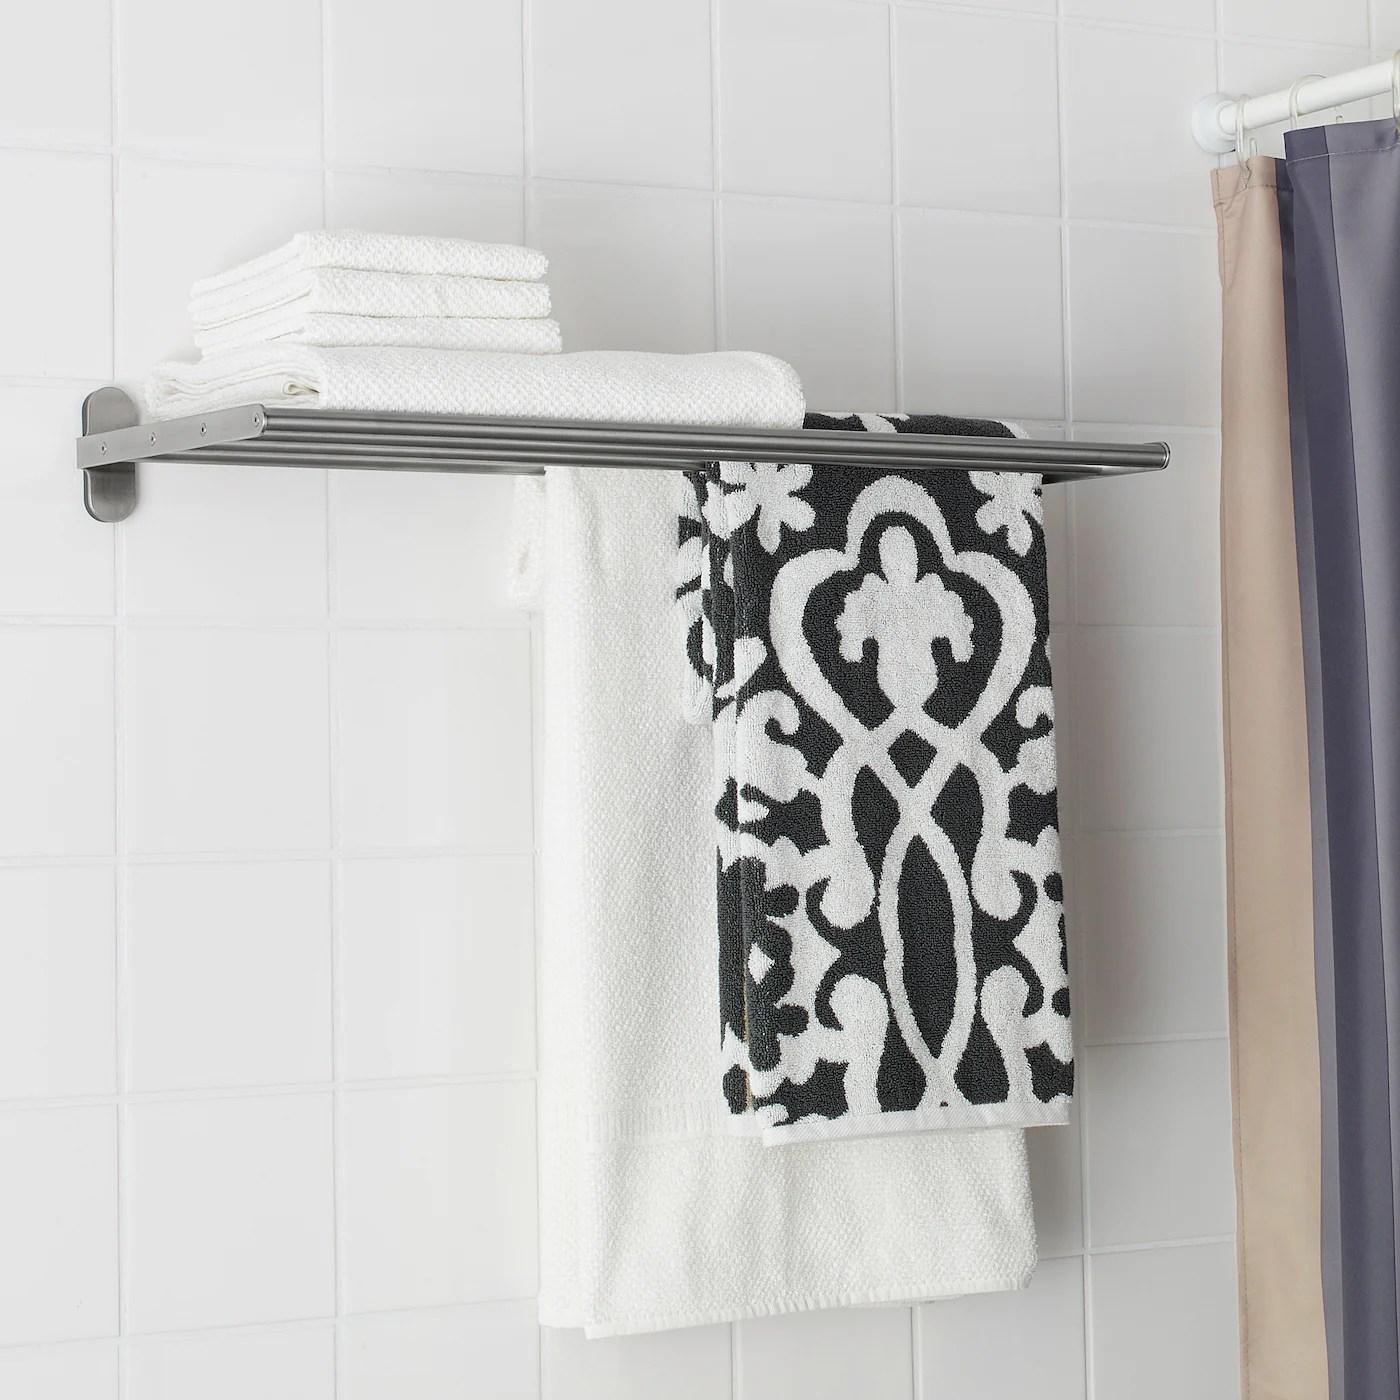 brogrund etagere murale ou porte serviettes acier inoxydable 67x27 cm